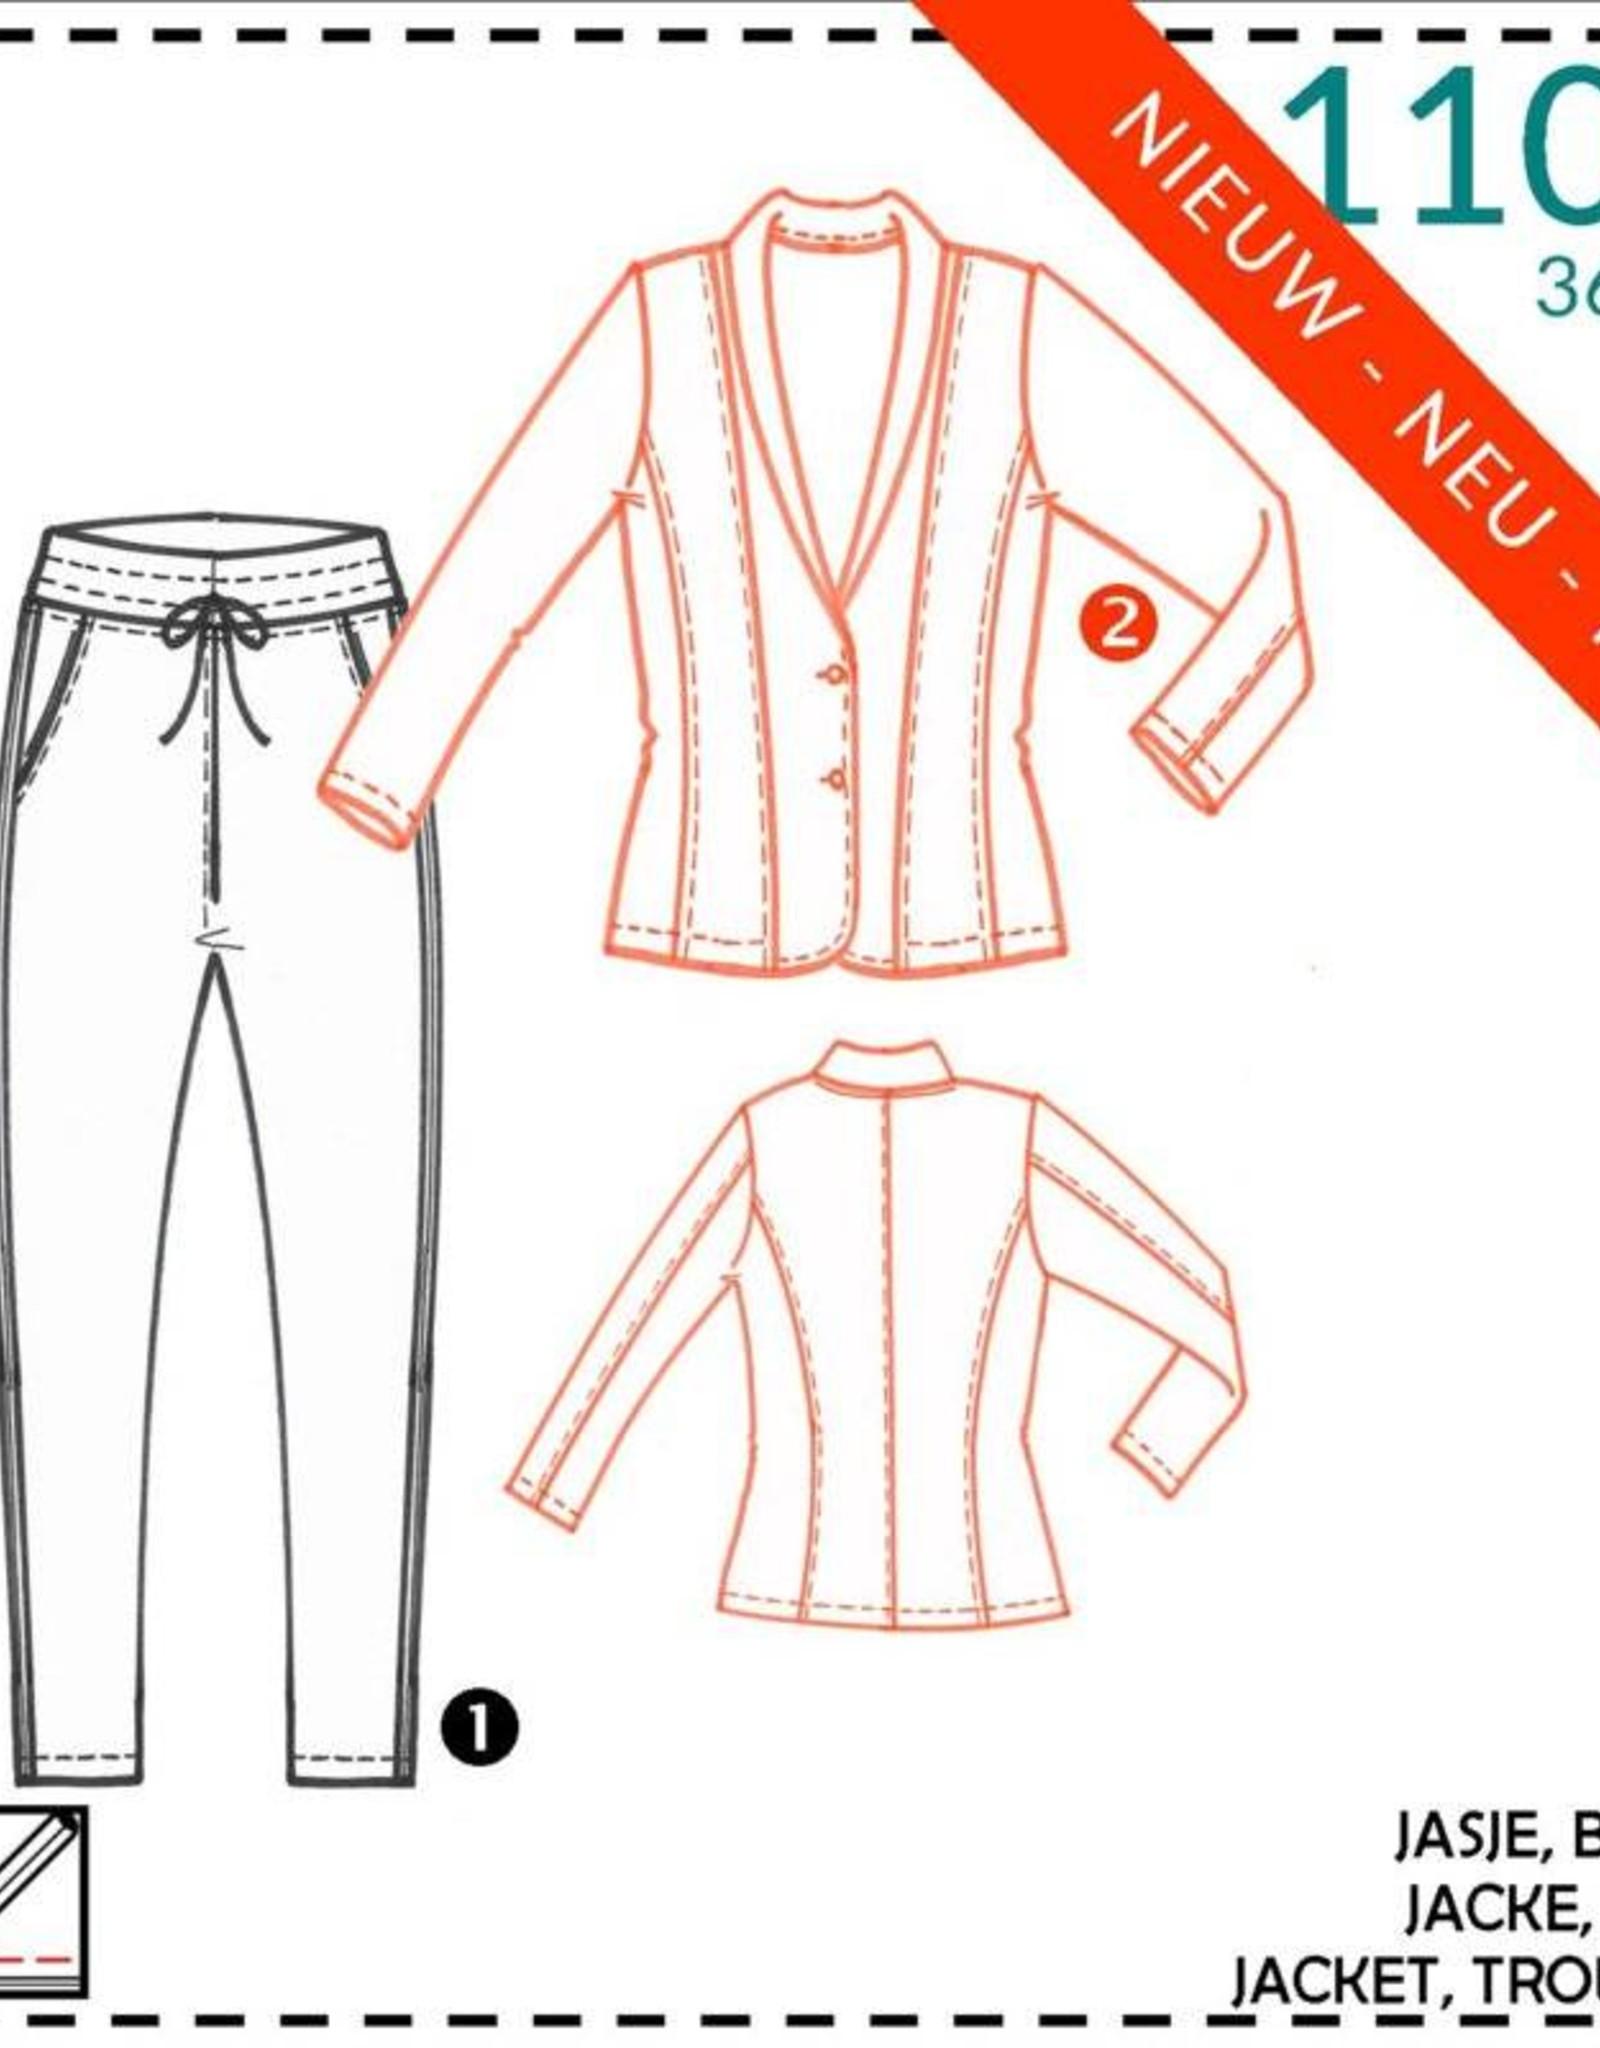 It's A fits It's A fits patroon 1102